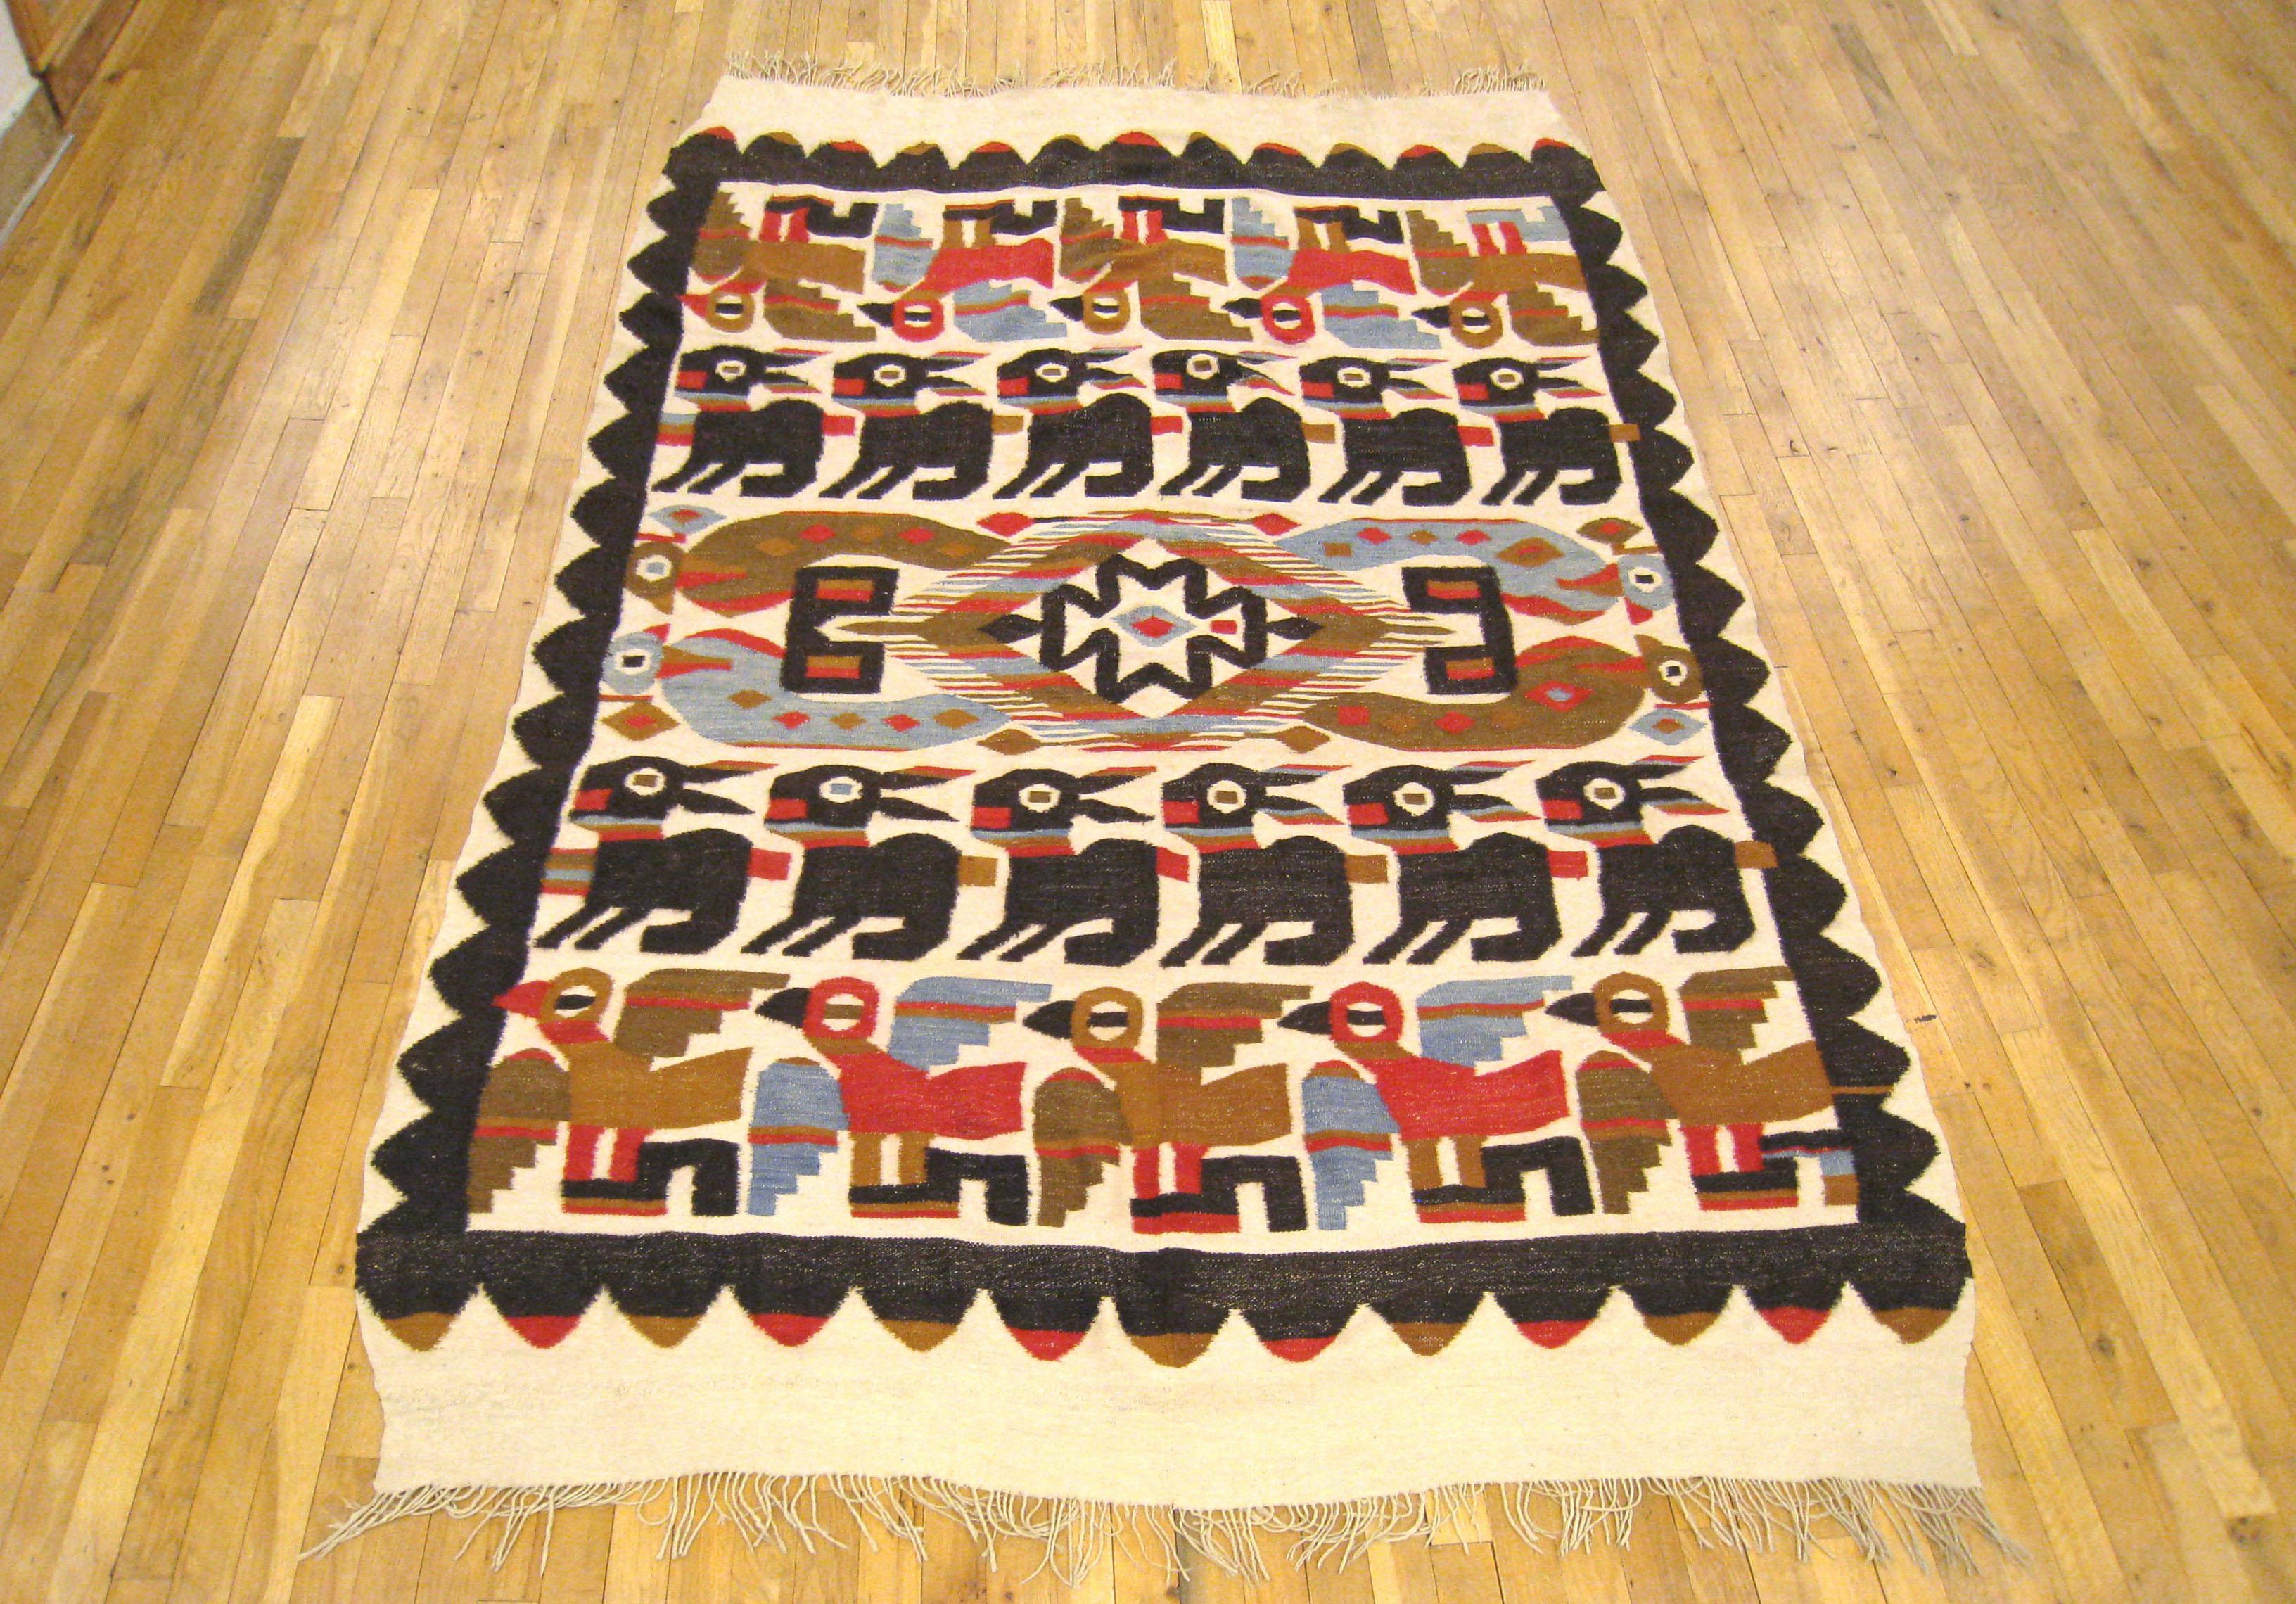 Handwoven handmade vintage ethnic Andean Peruvian tribal boho woven trim  upholstery loom Cuzco A010